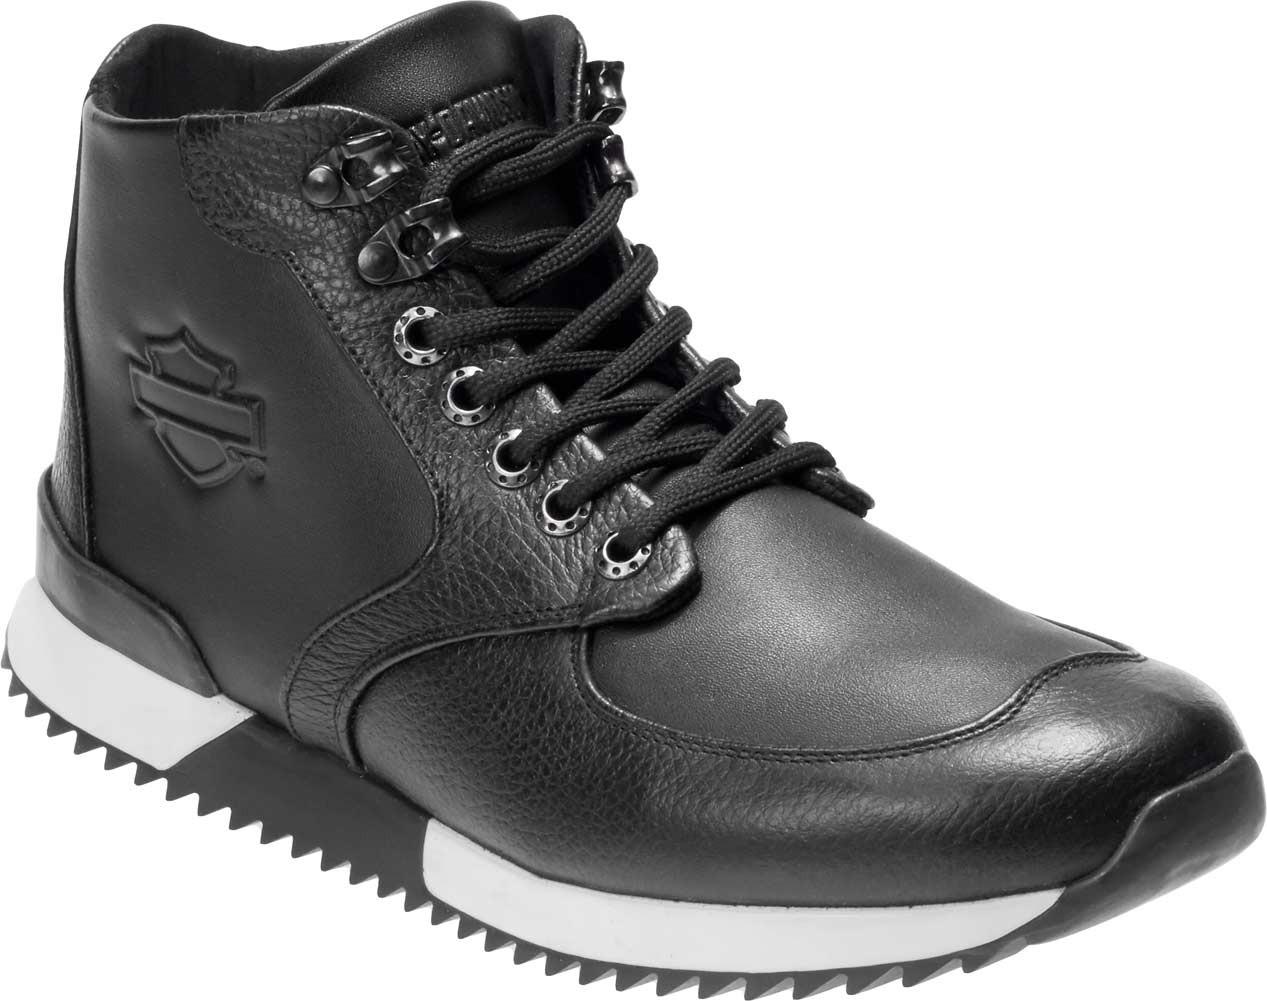 3ce1b5dbf99044 Harley-Davidson® Men s Cadden Black Leather Sneakers D93546 - Wisconsin  Harley-Davidson